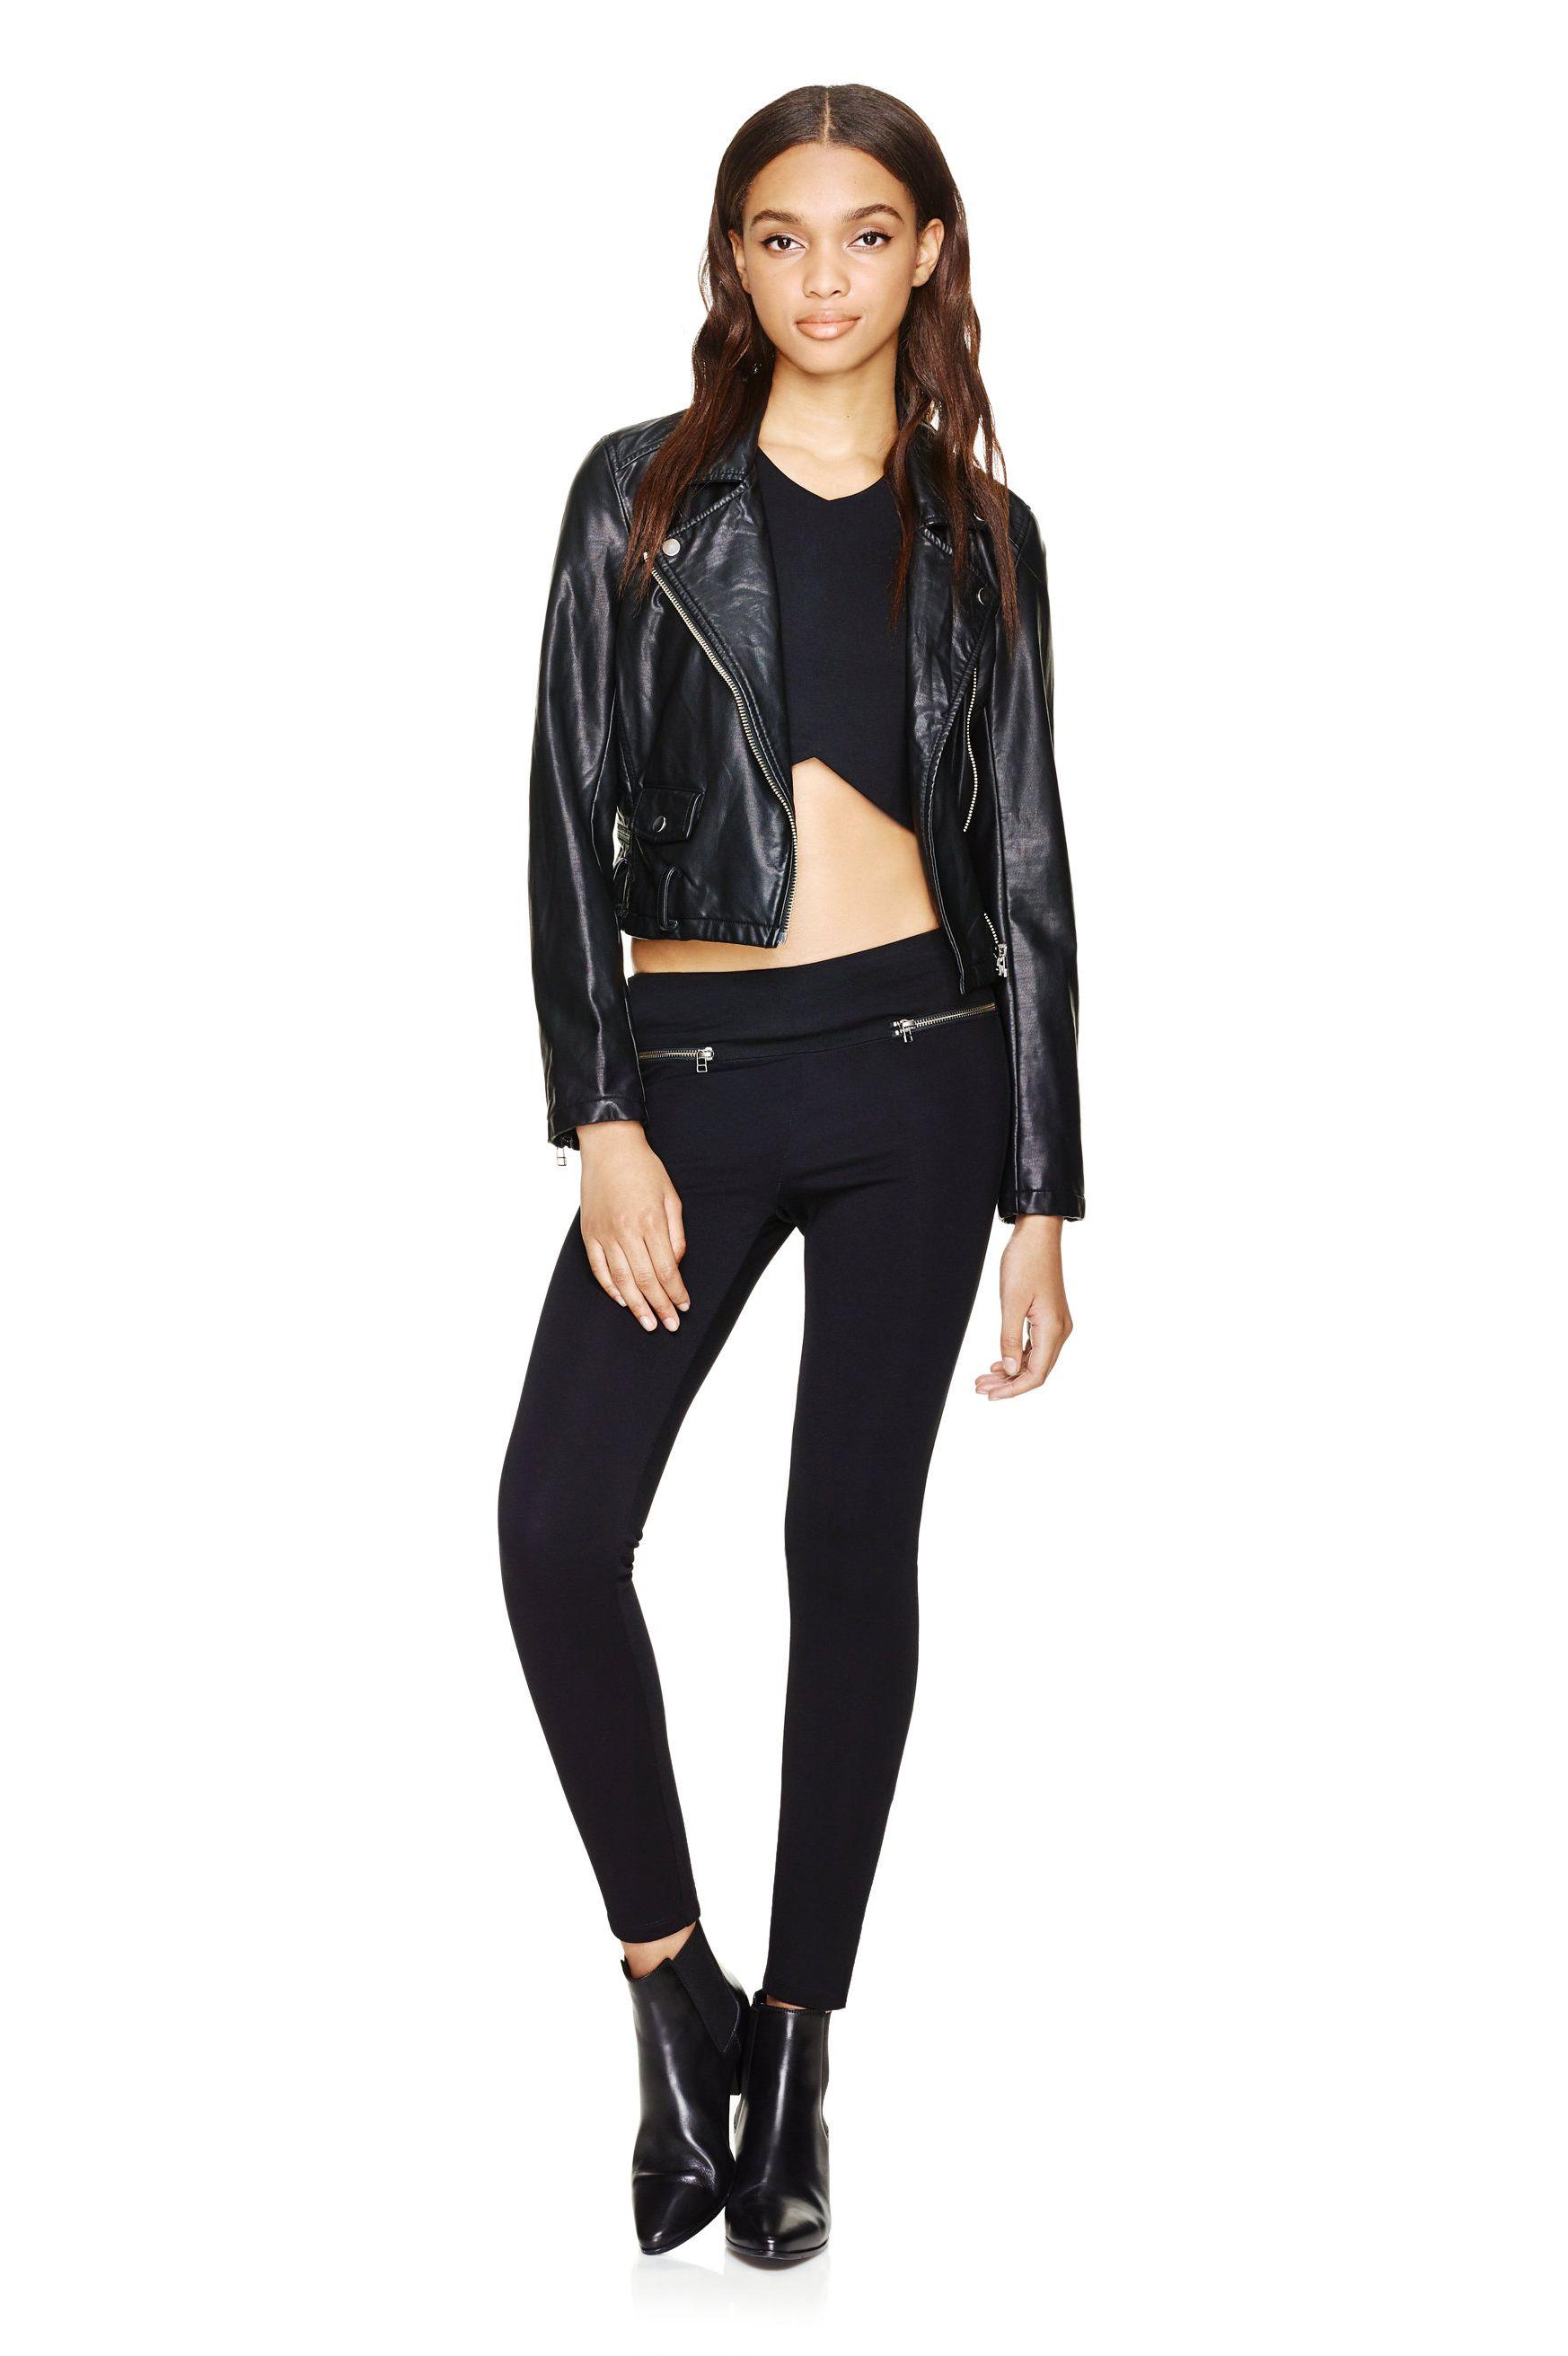 32 Aritzia Finds That Look SO Fancy Faux leather jackets